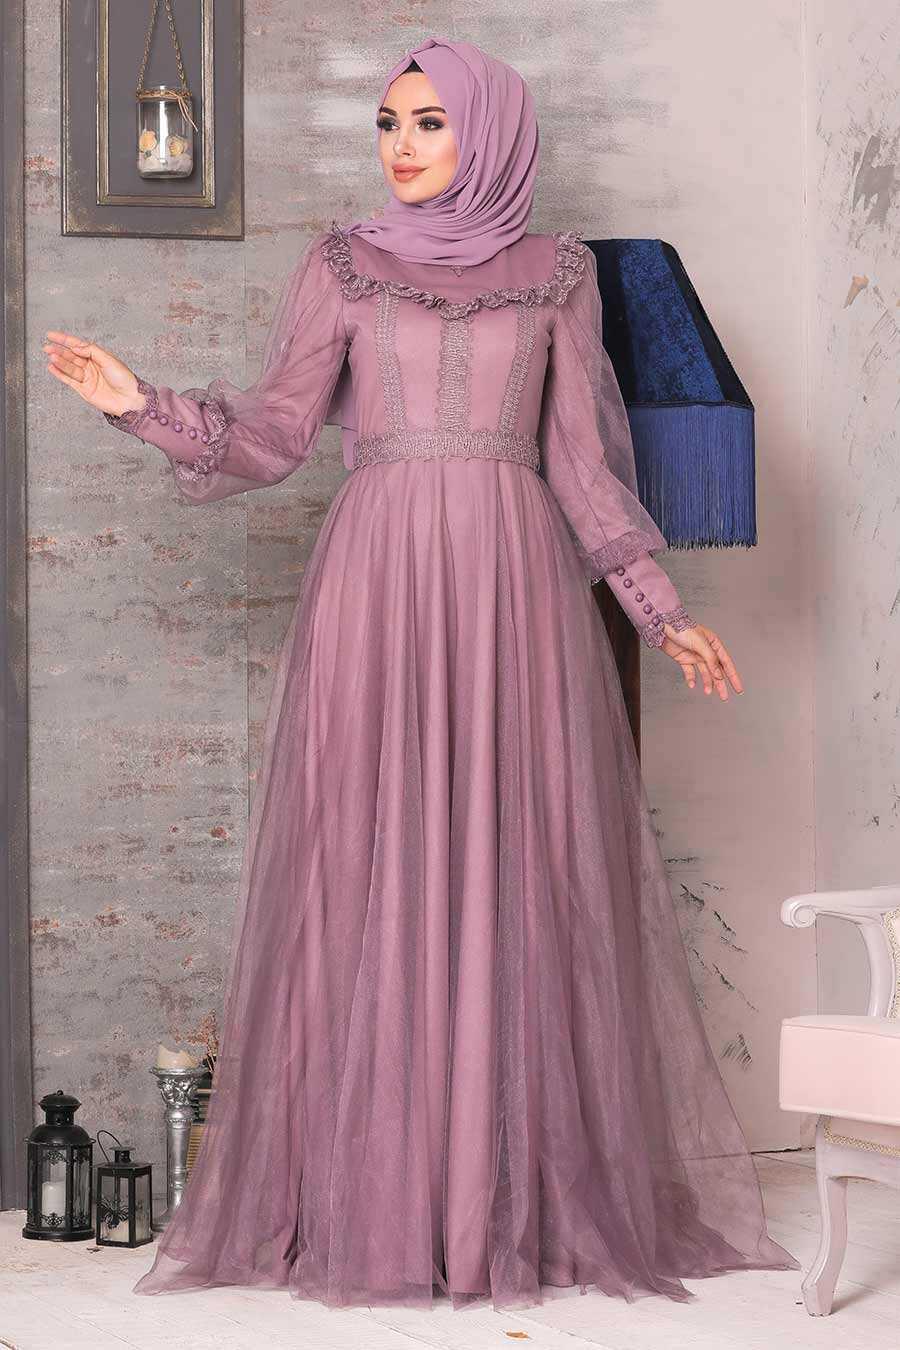 Dusty Rose Evening Dress 21790GK